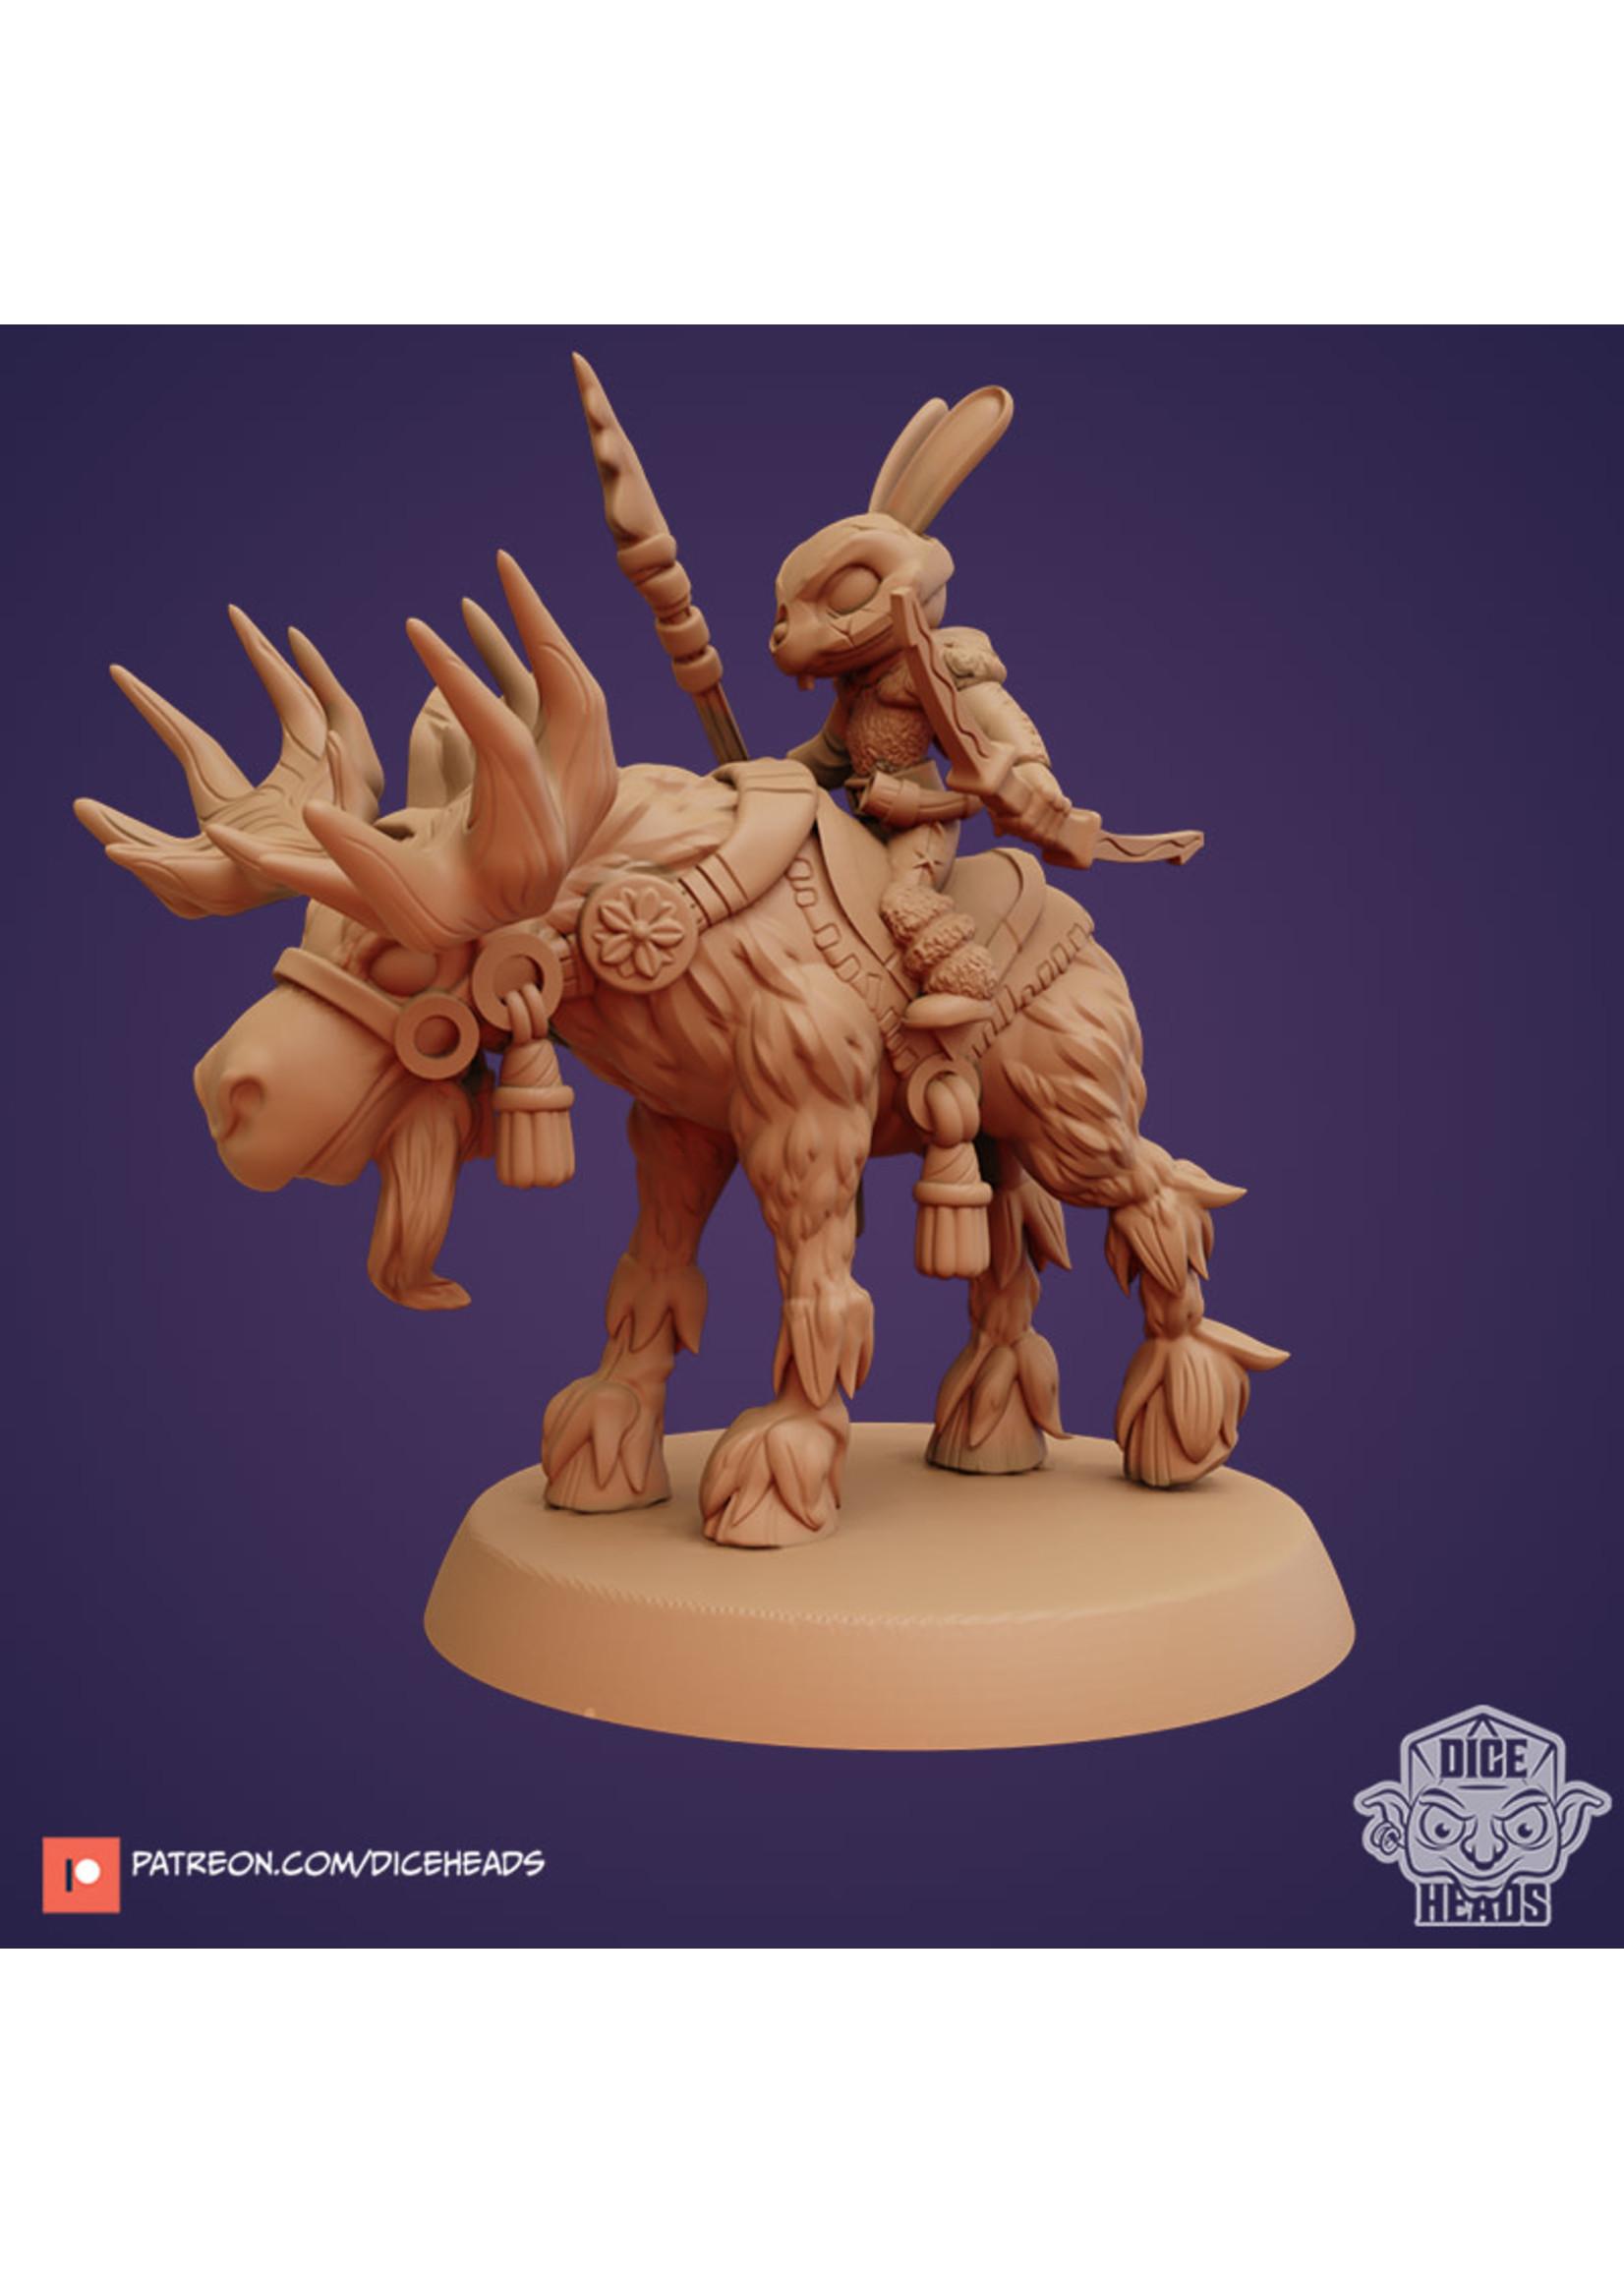 3D Printed Miniature - Moose Mount - Dungeons & Dragons - Zoontalis KS